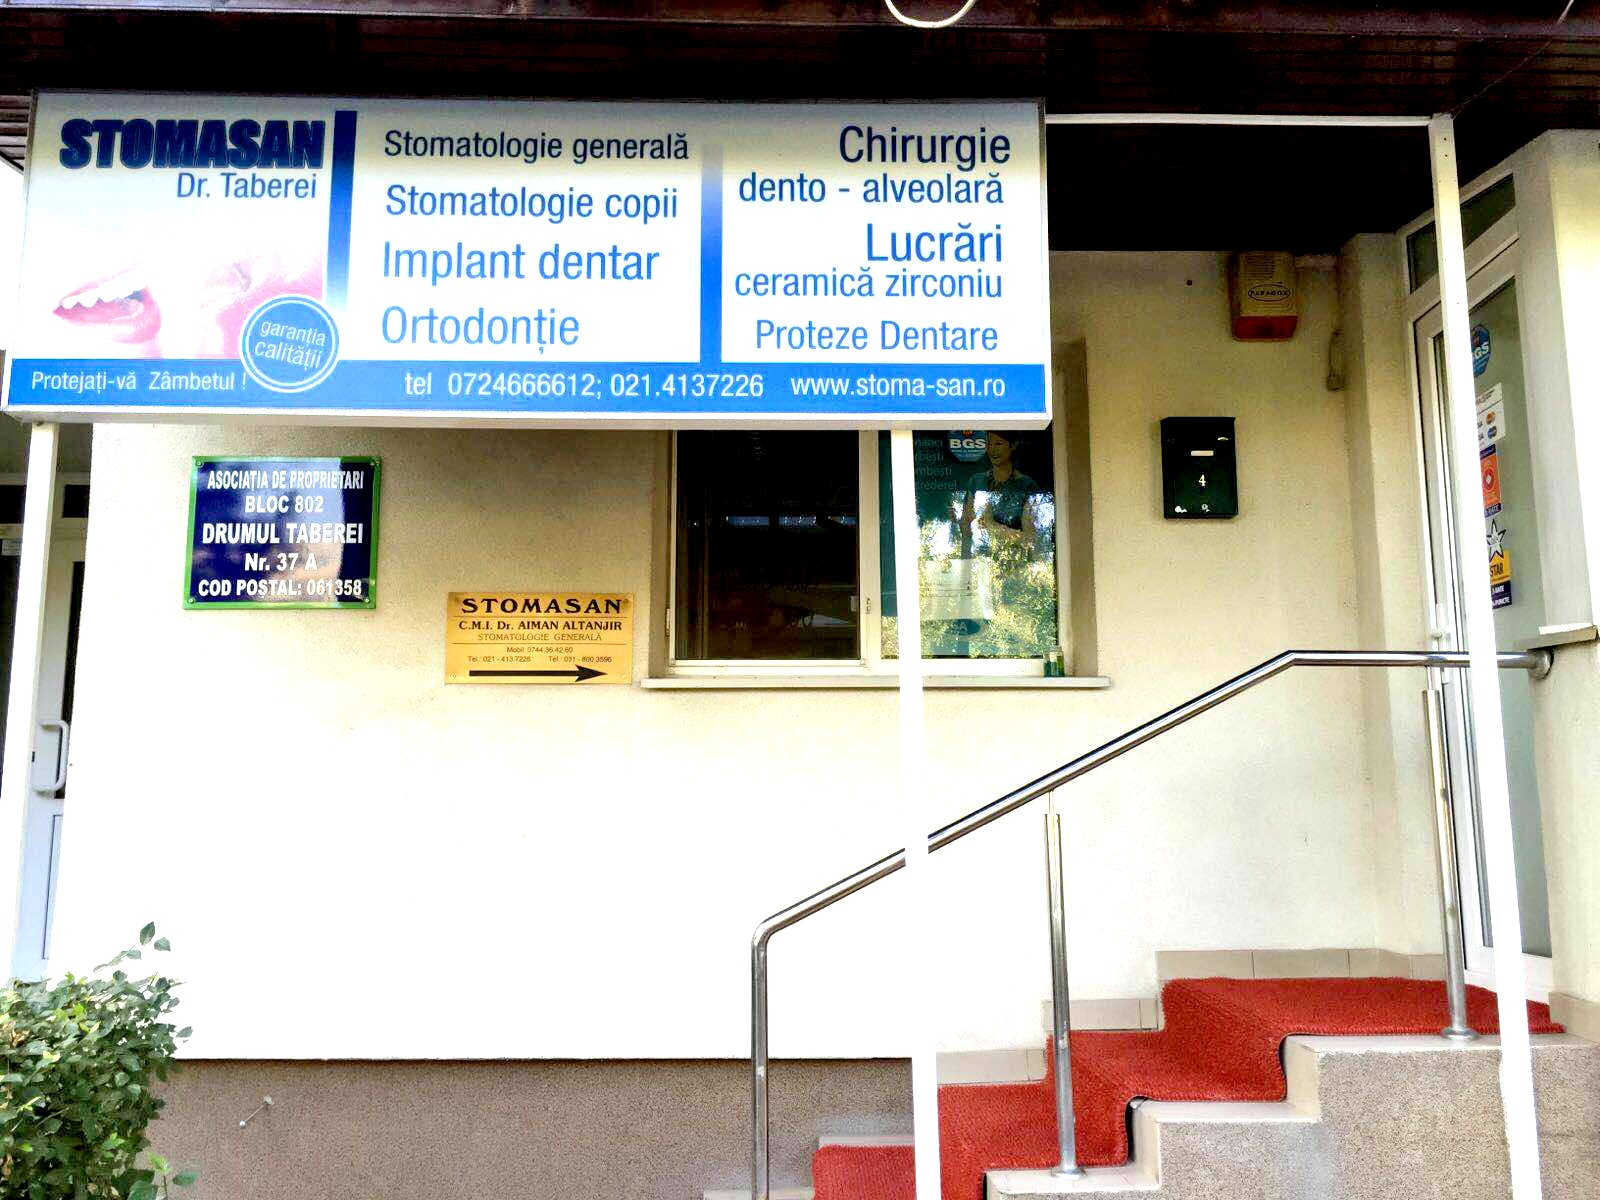 locatie-stomatologie-drumul-taberei-stoma-san